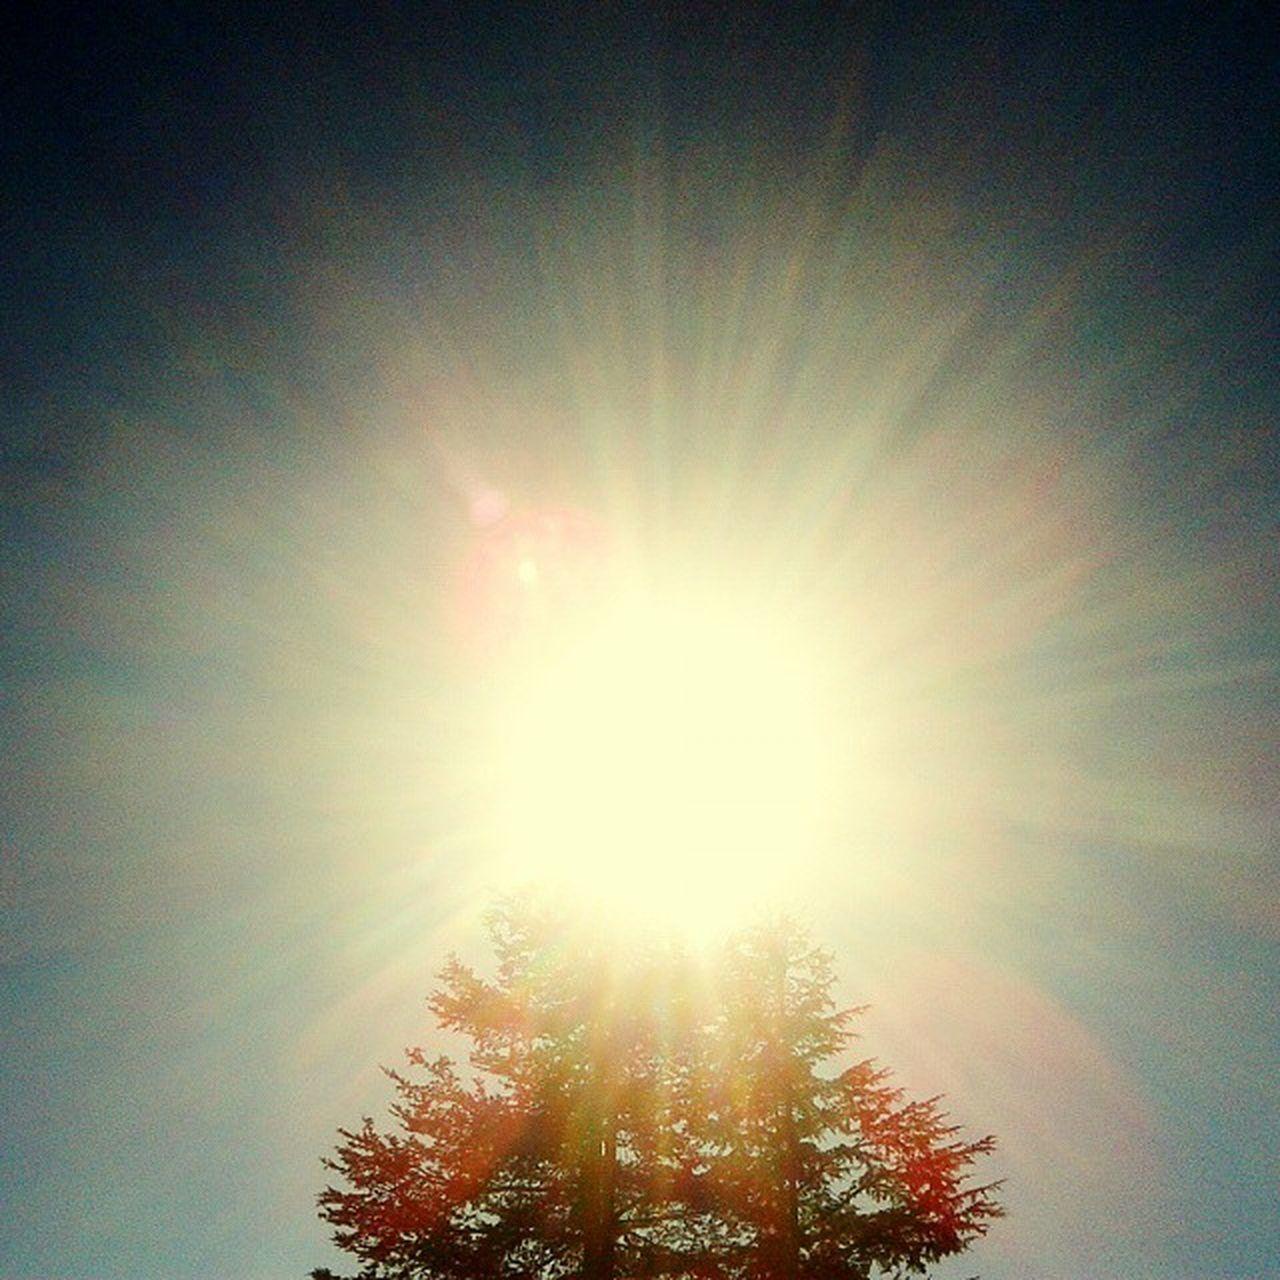 Huggingatree  Treeandsky Fortheloveoftree Treeandsun Sunshine Lookupandthrive EyeEm Eyeemfilter Frommypointofview 🌲👌